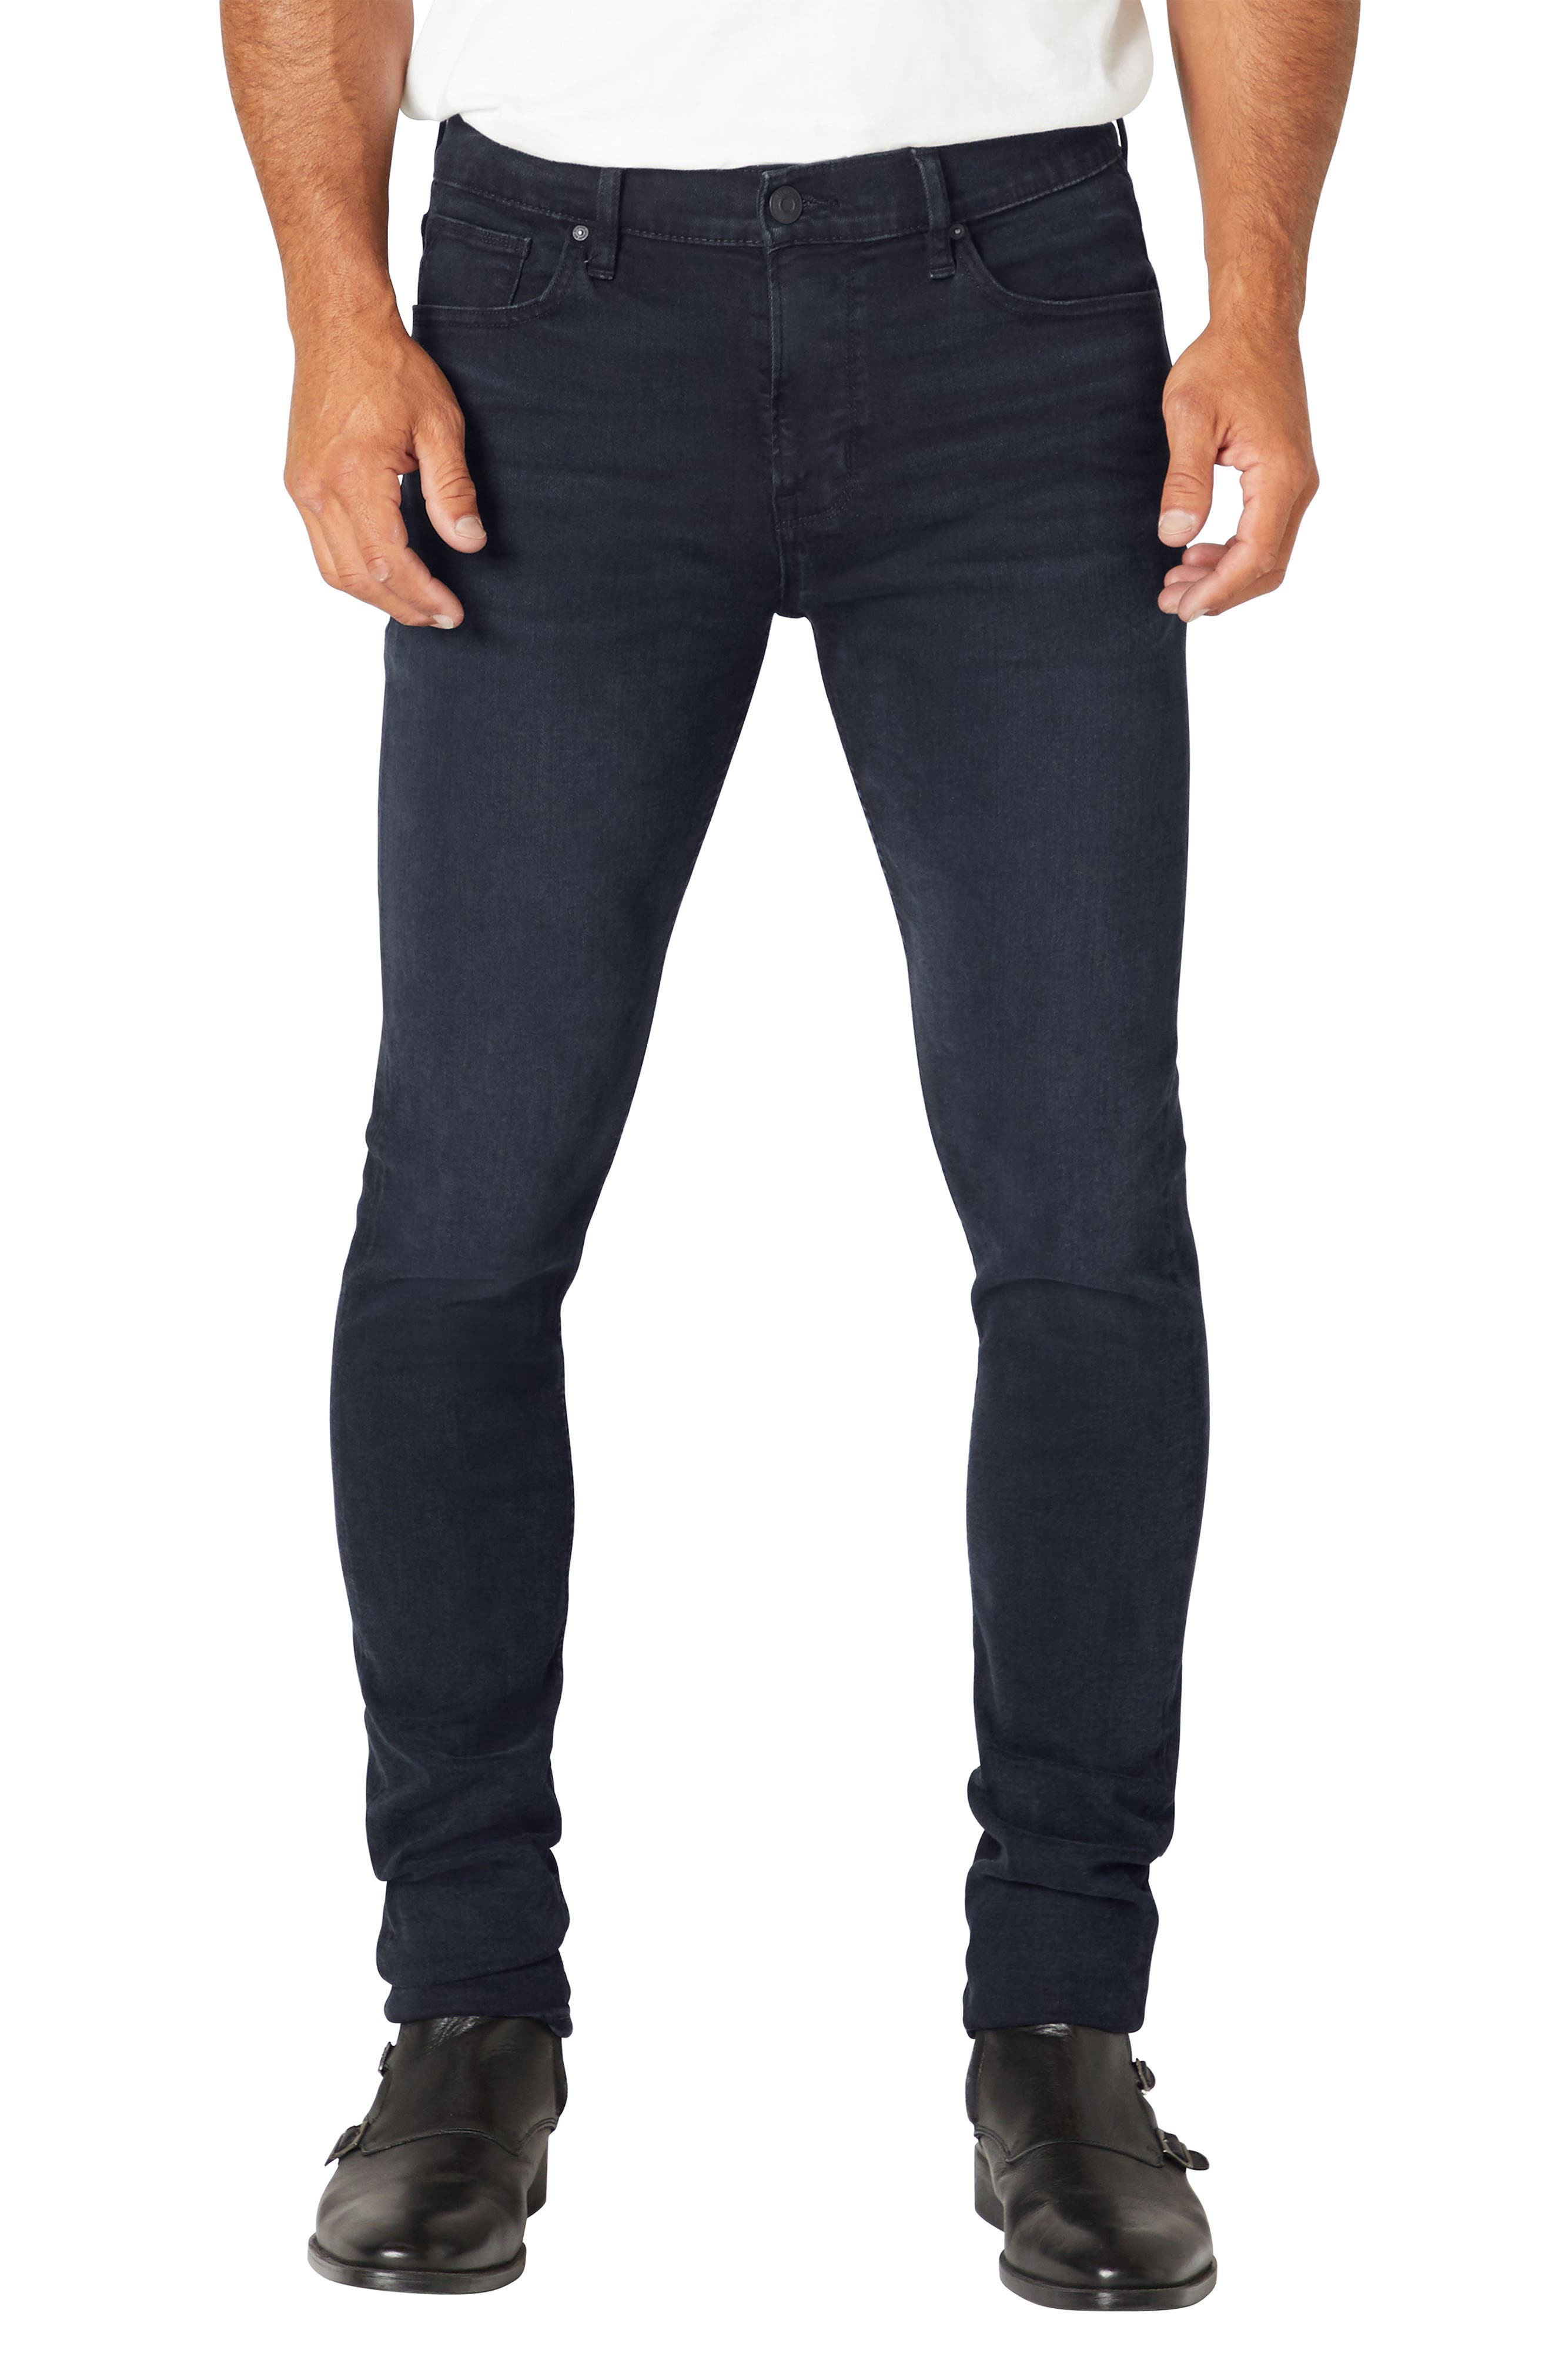 Blake Slim Straight Leg Jeans